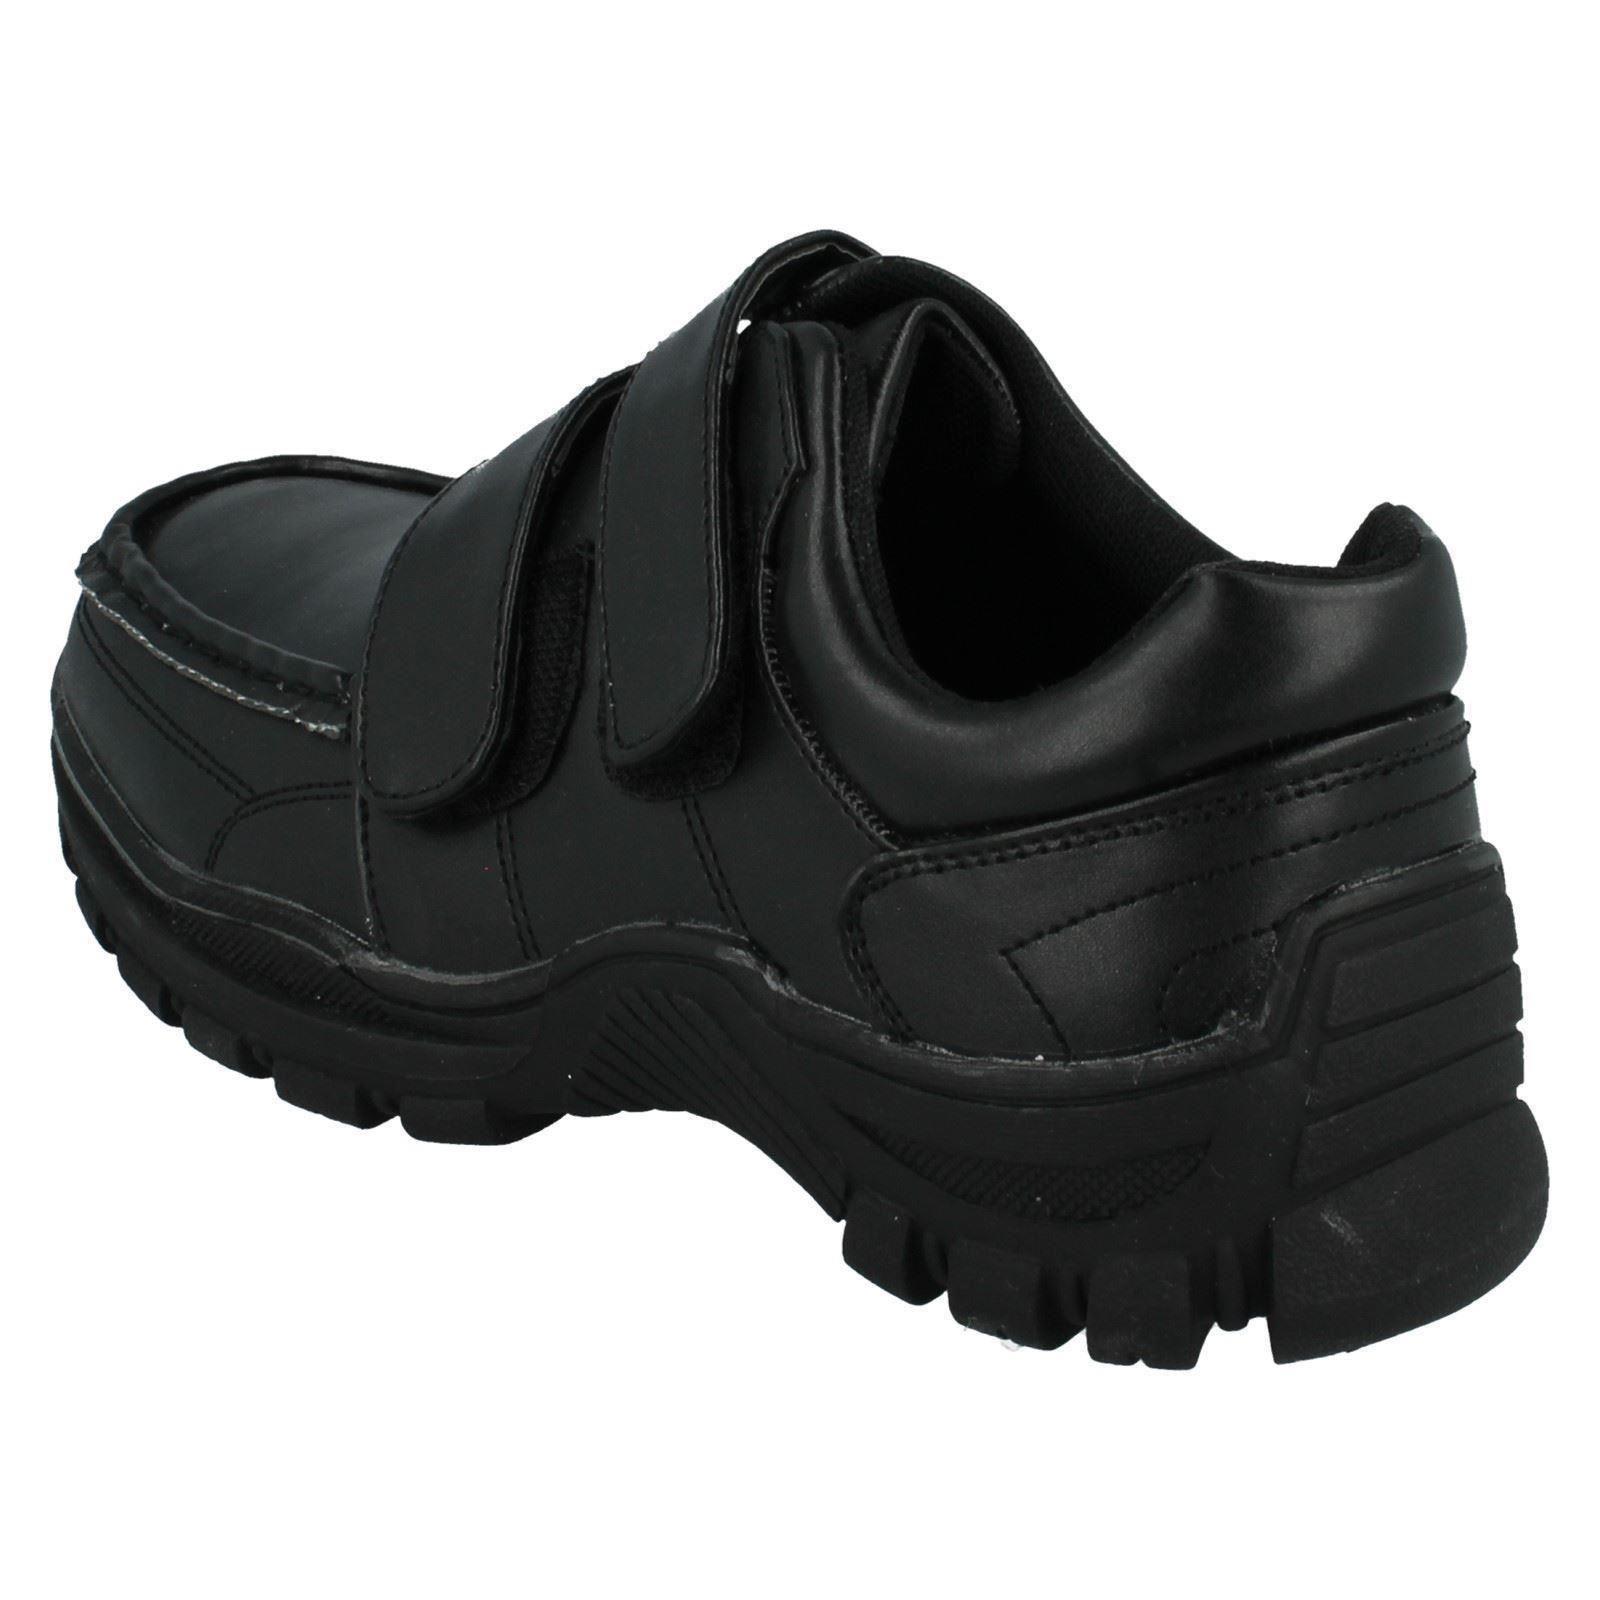 Chicos Etiqueta Roja Doble Correa Escuela Zapatos